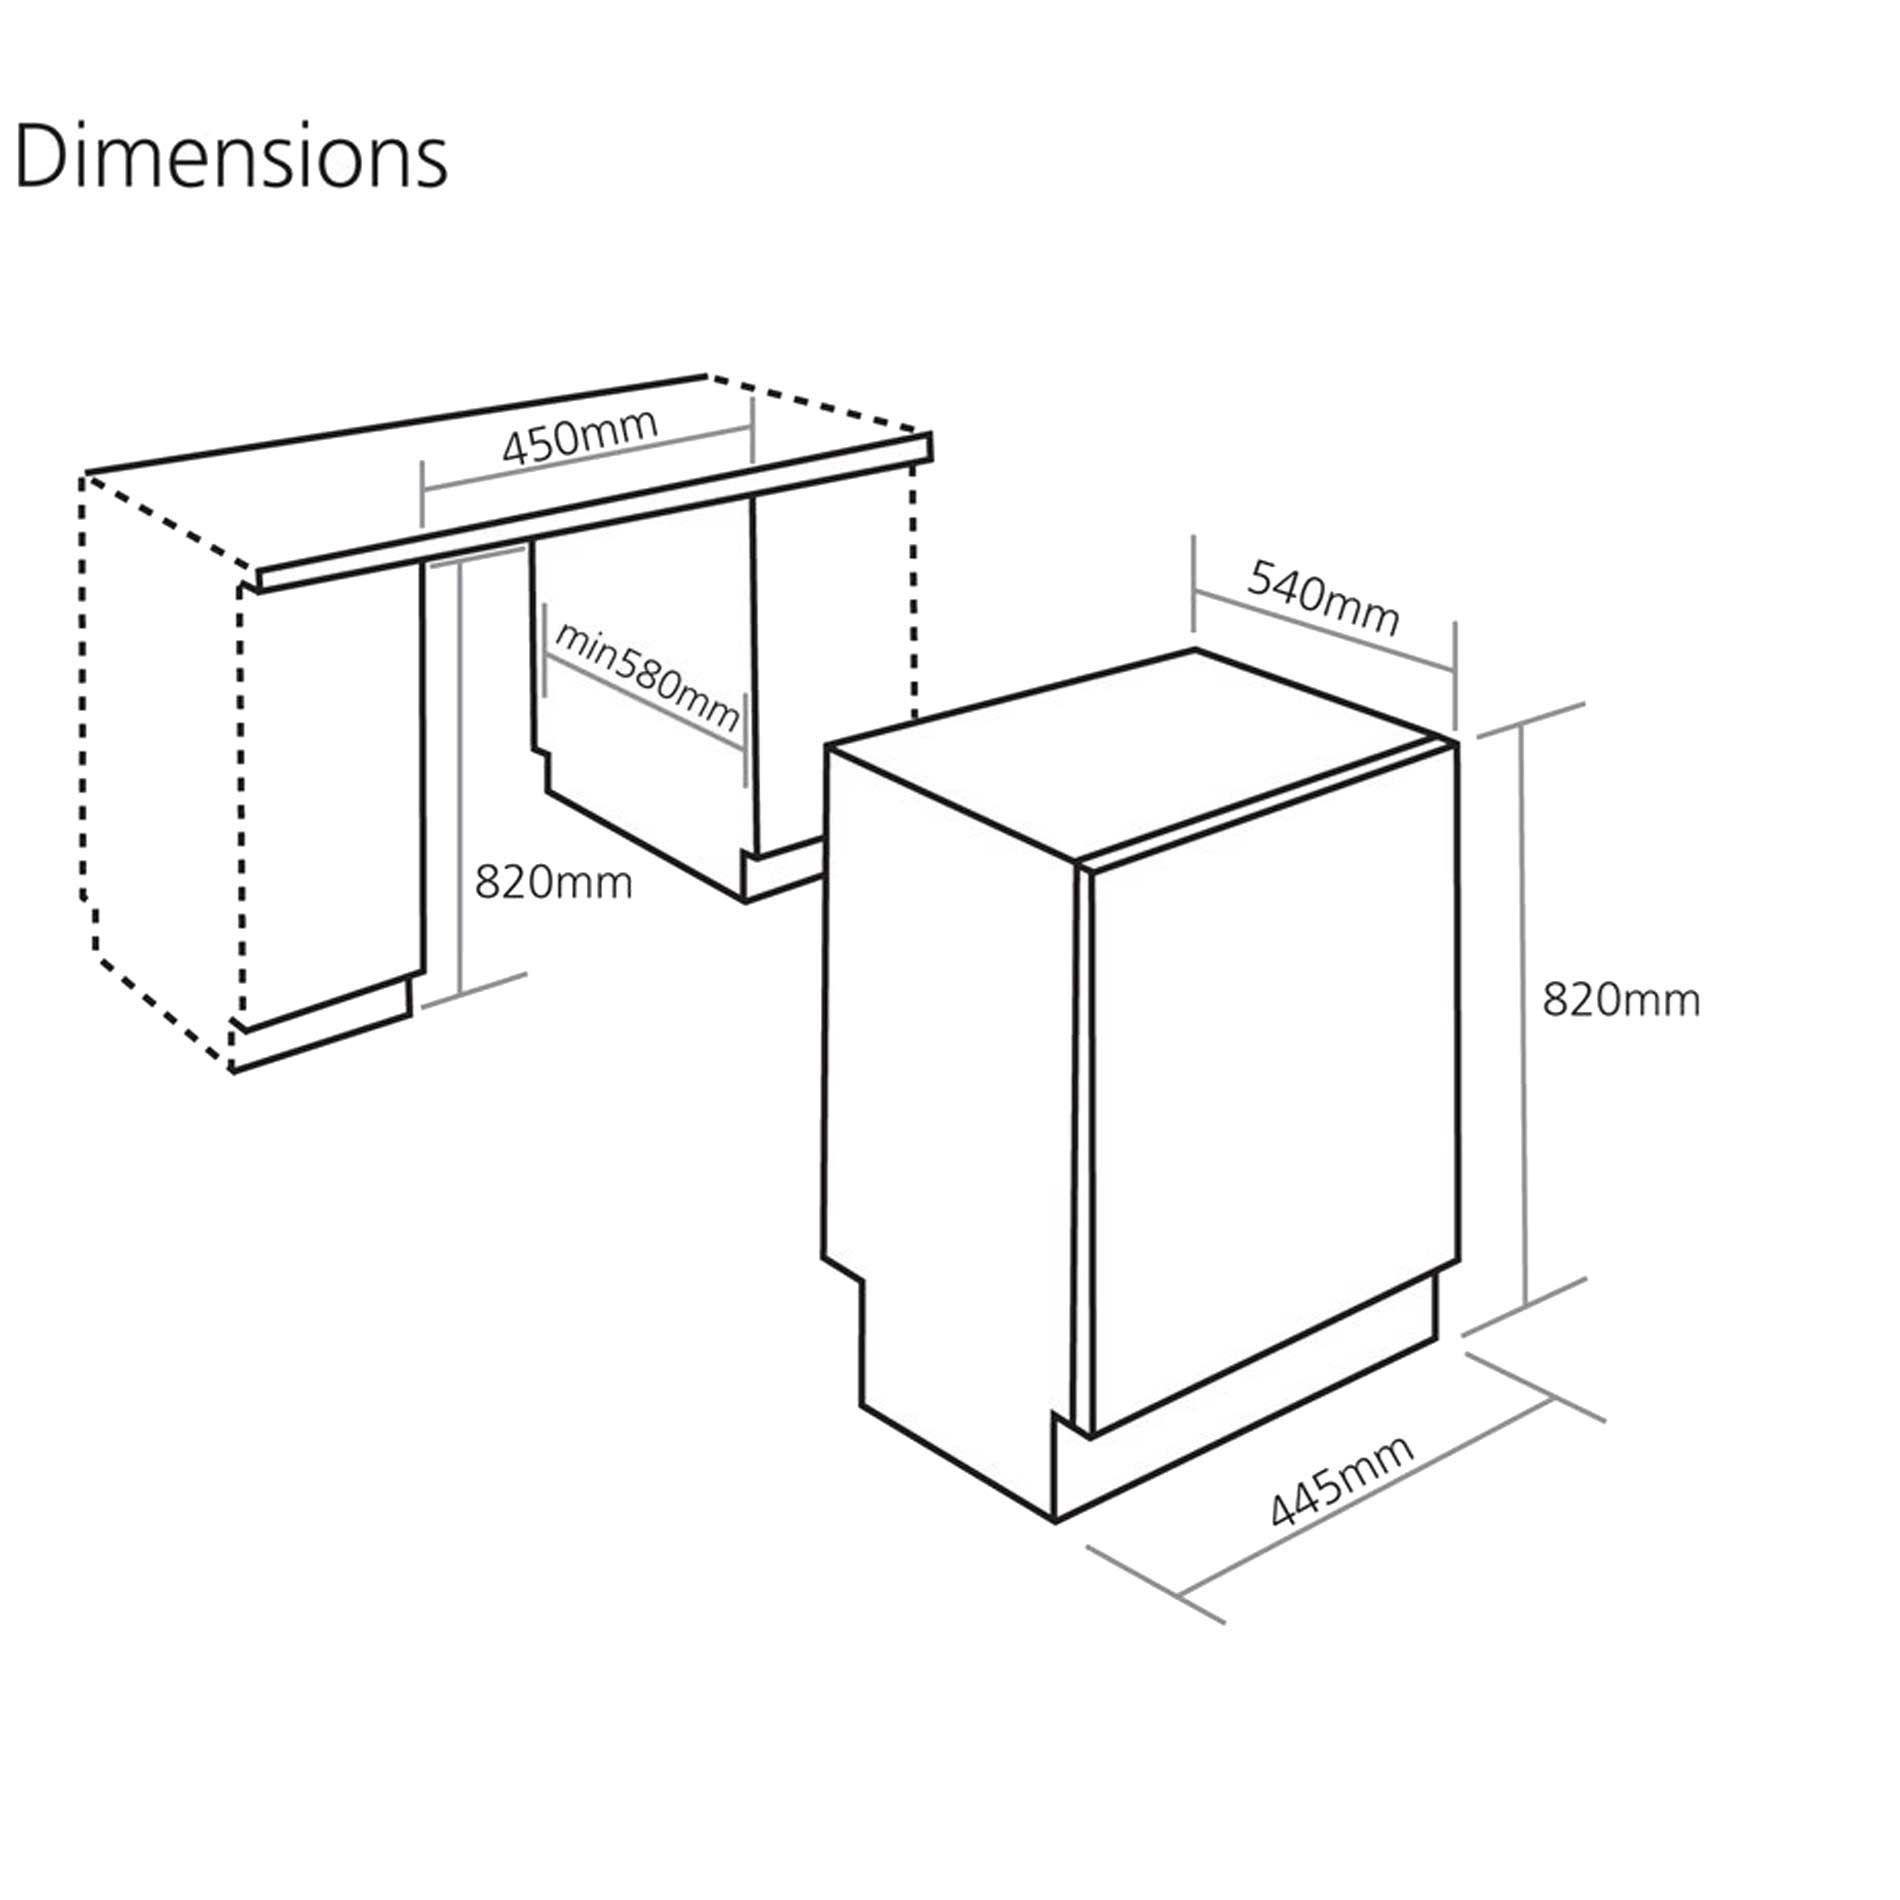 Caple di482 slimline fully integrated dishwasher fully